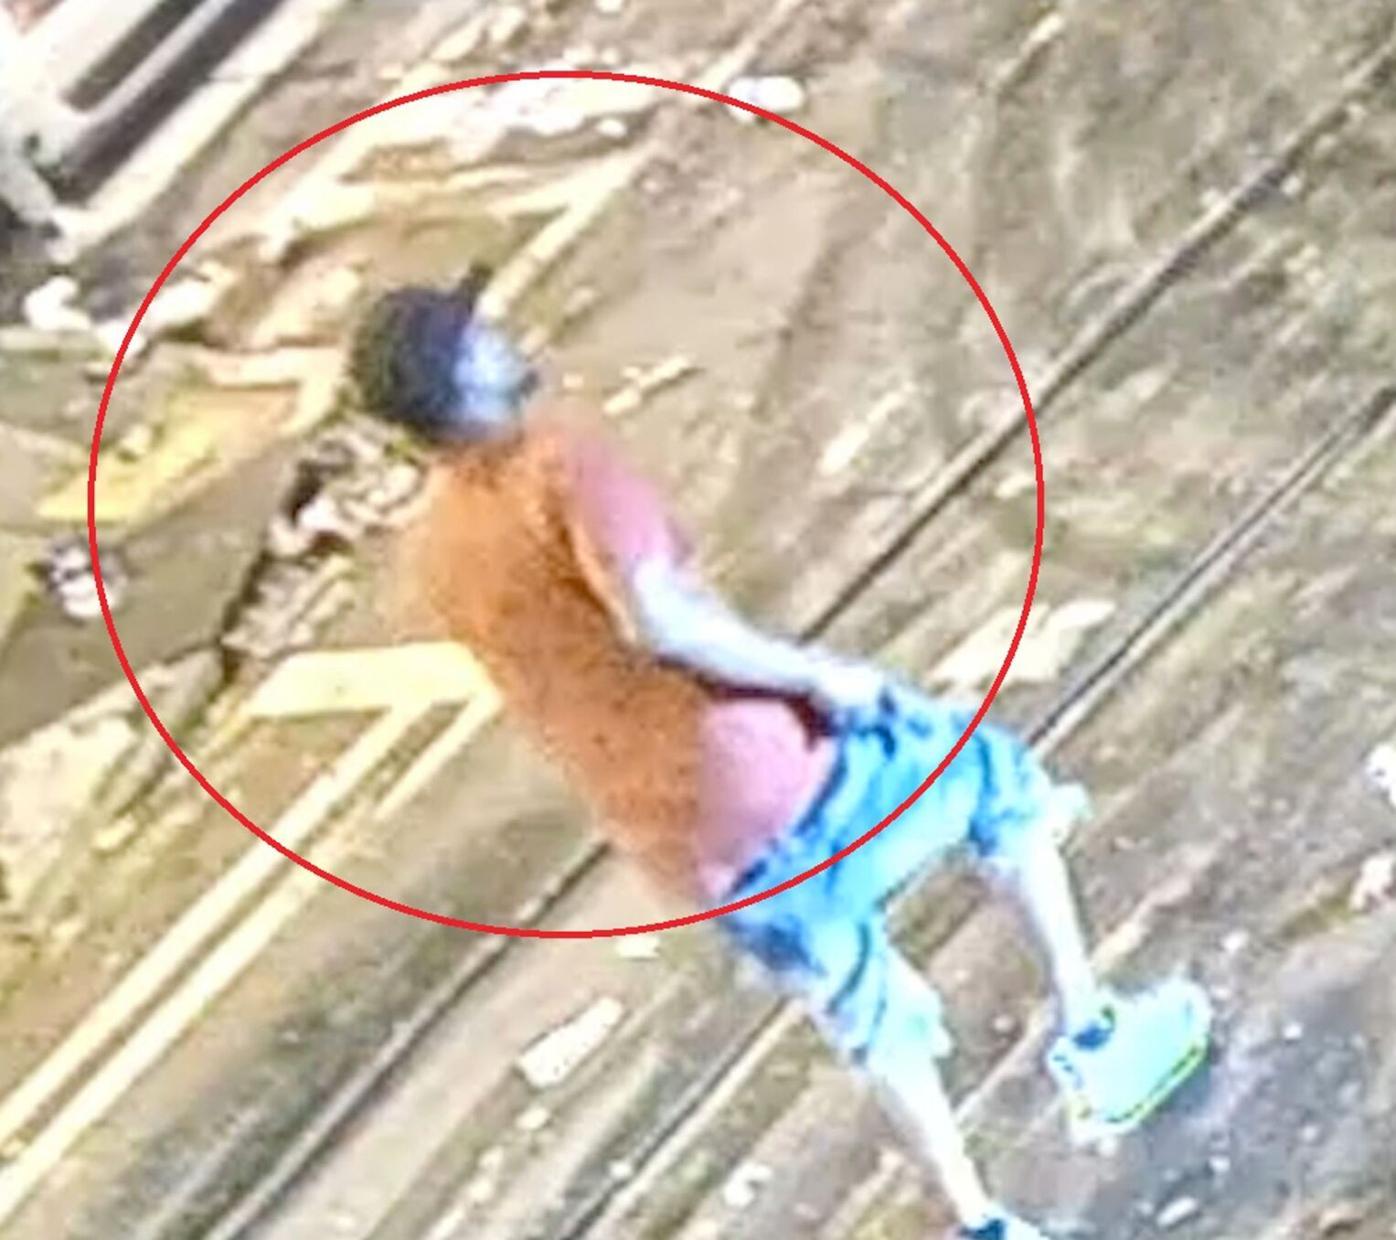 092320_MNS_double_murder_001 suspect